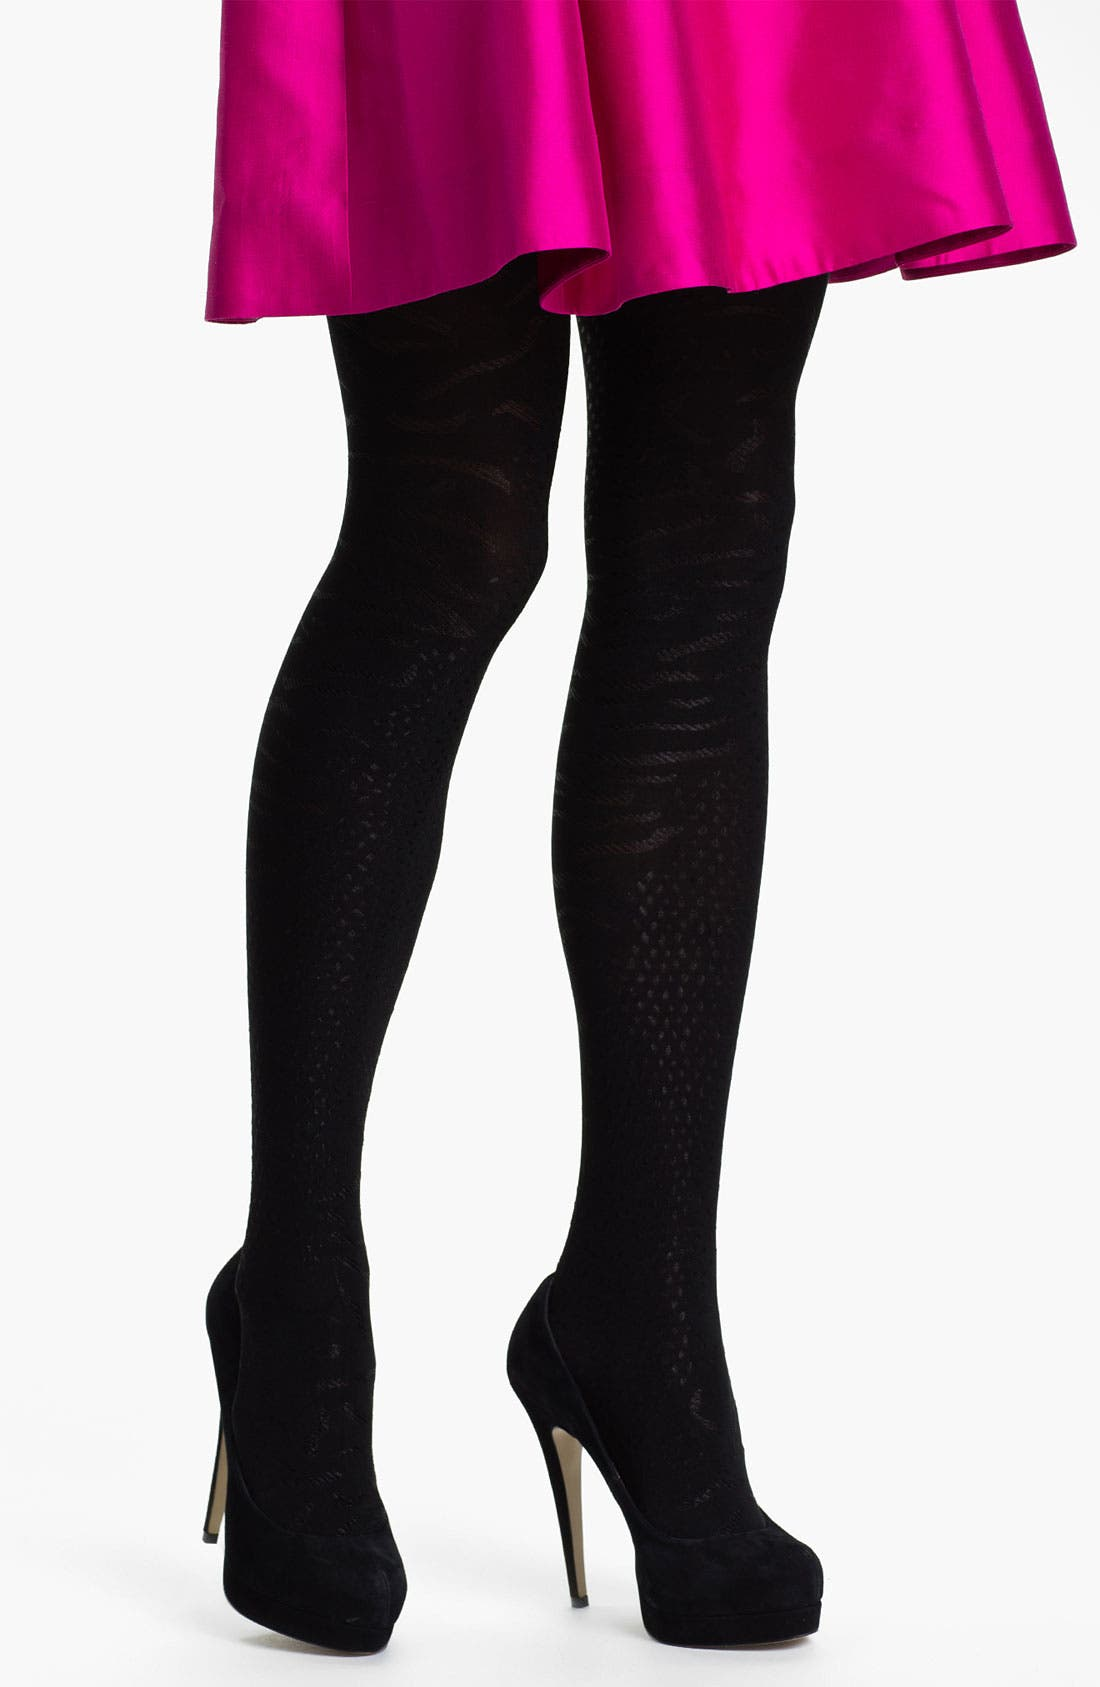 Alternate Image 1 Selected - DKNY 'Animal Skin' Tights